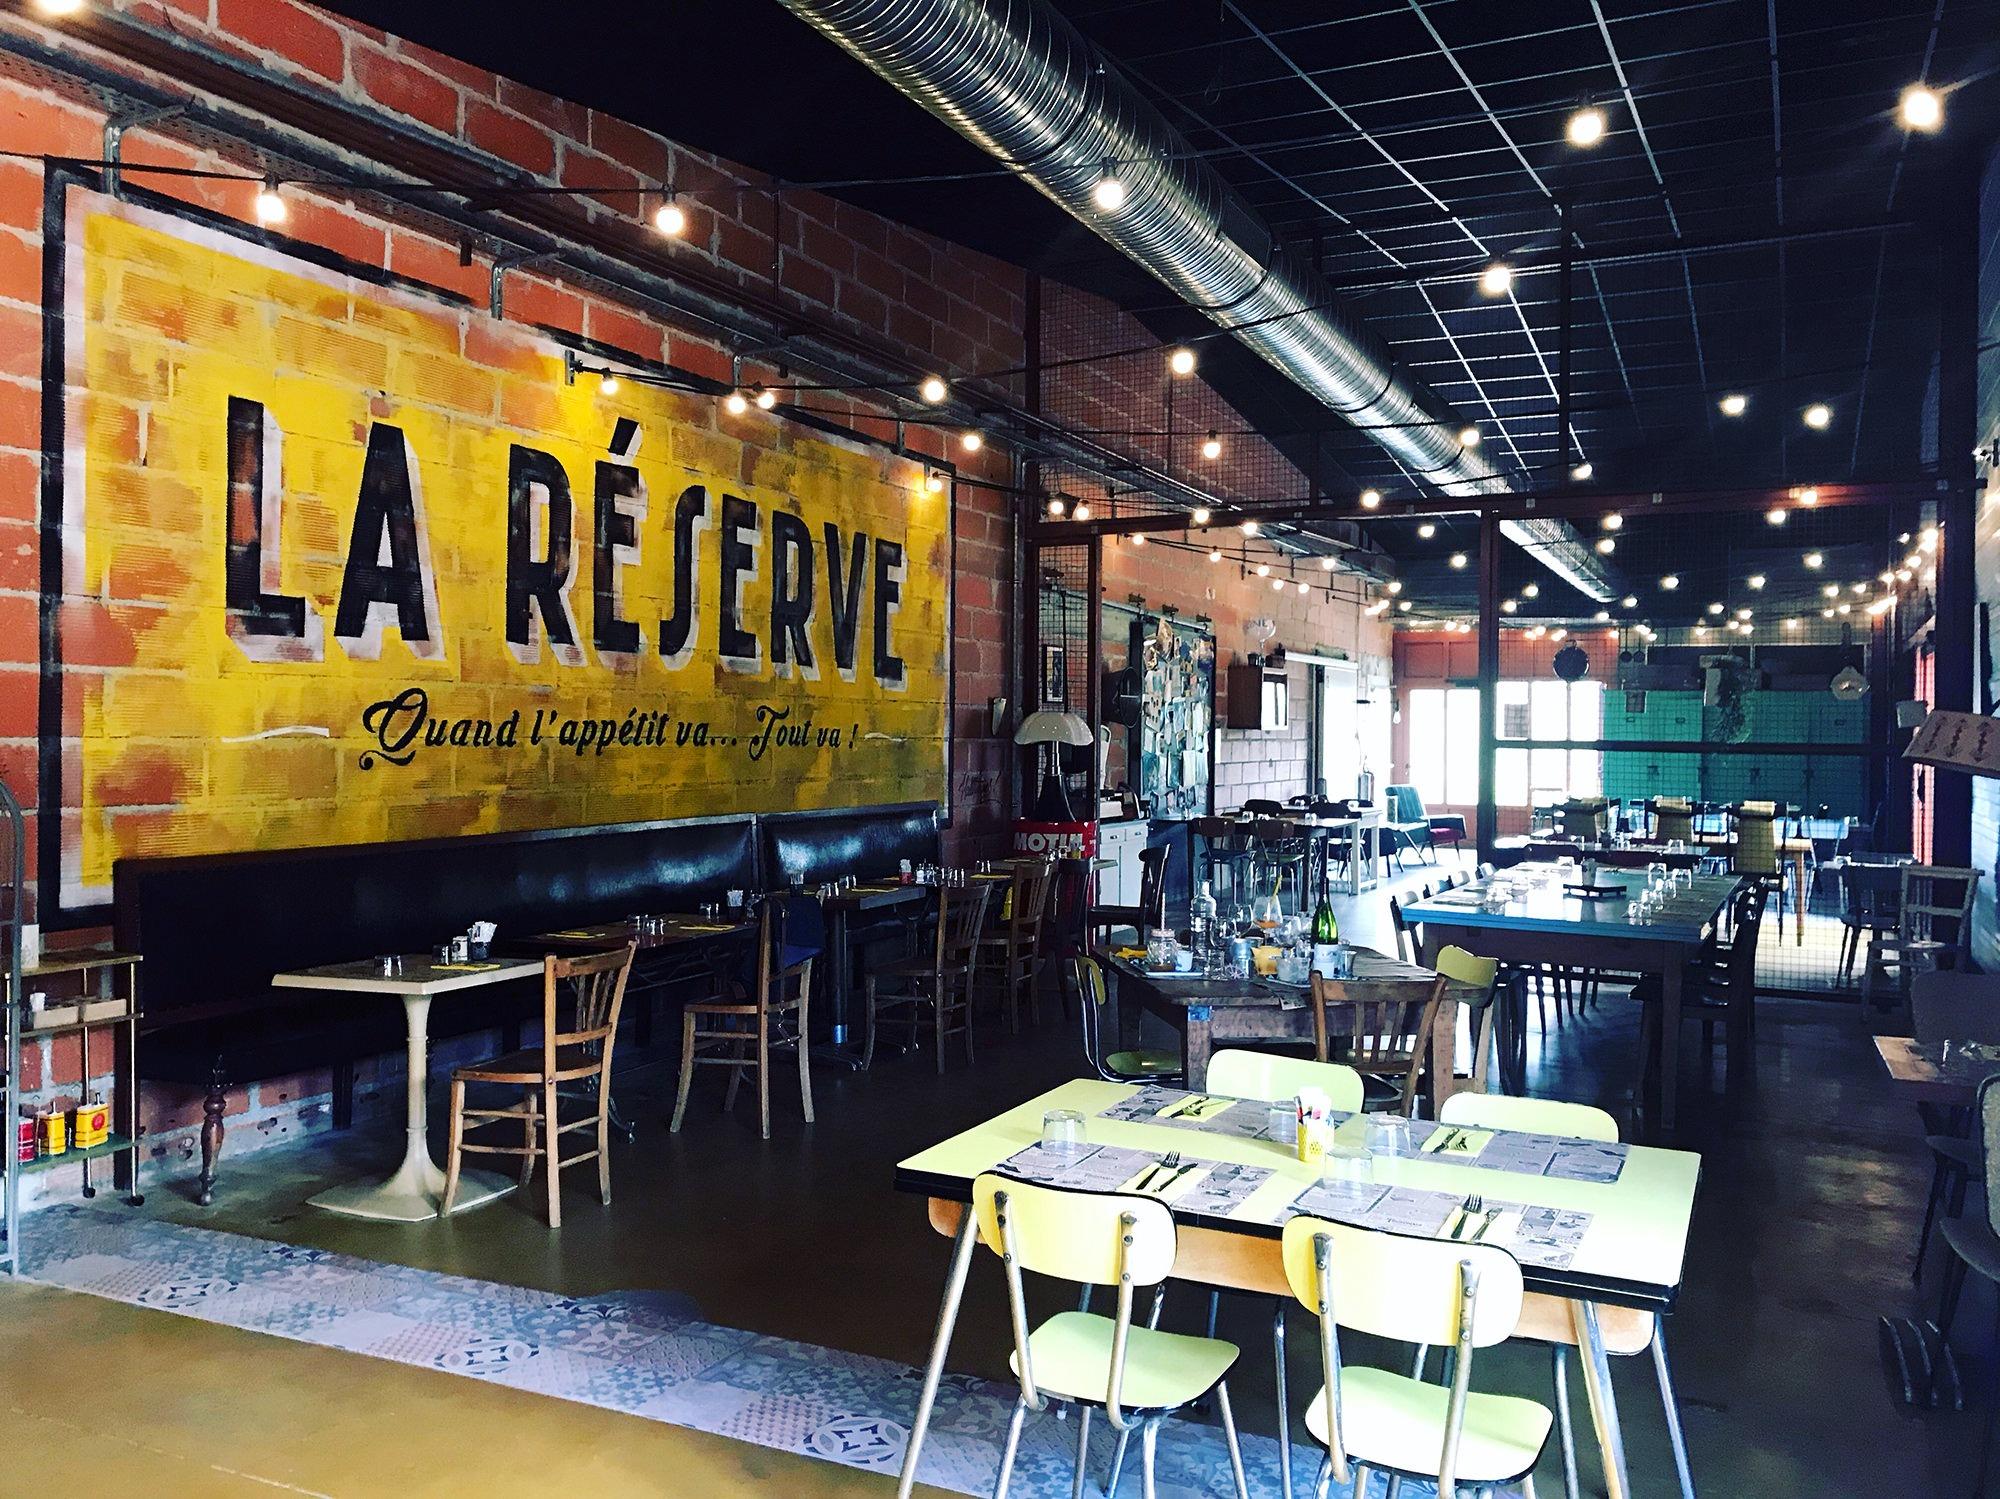 decoration-restaurant-graffiti-fresque-vintage